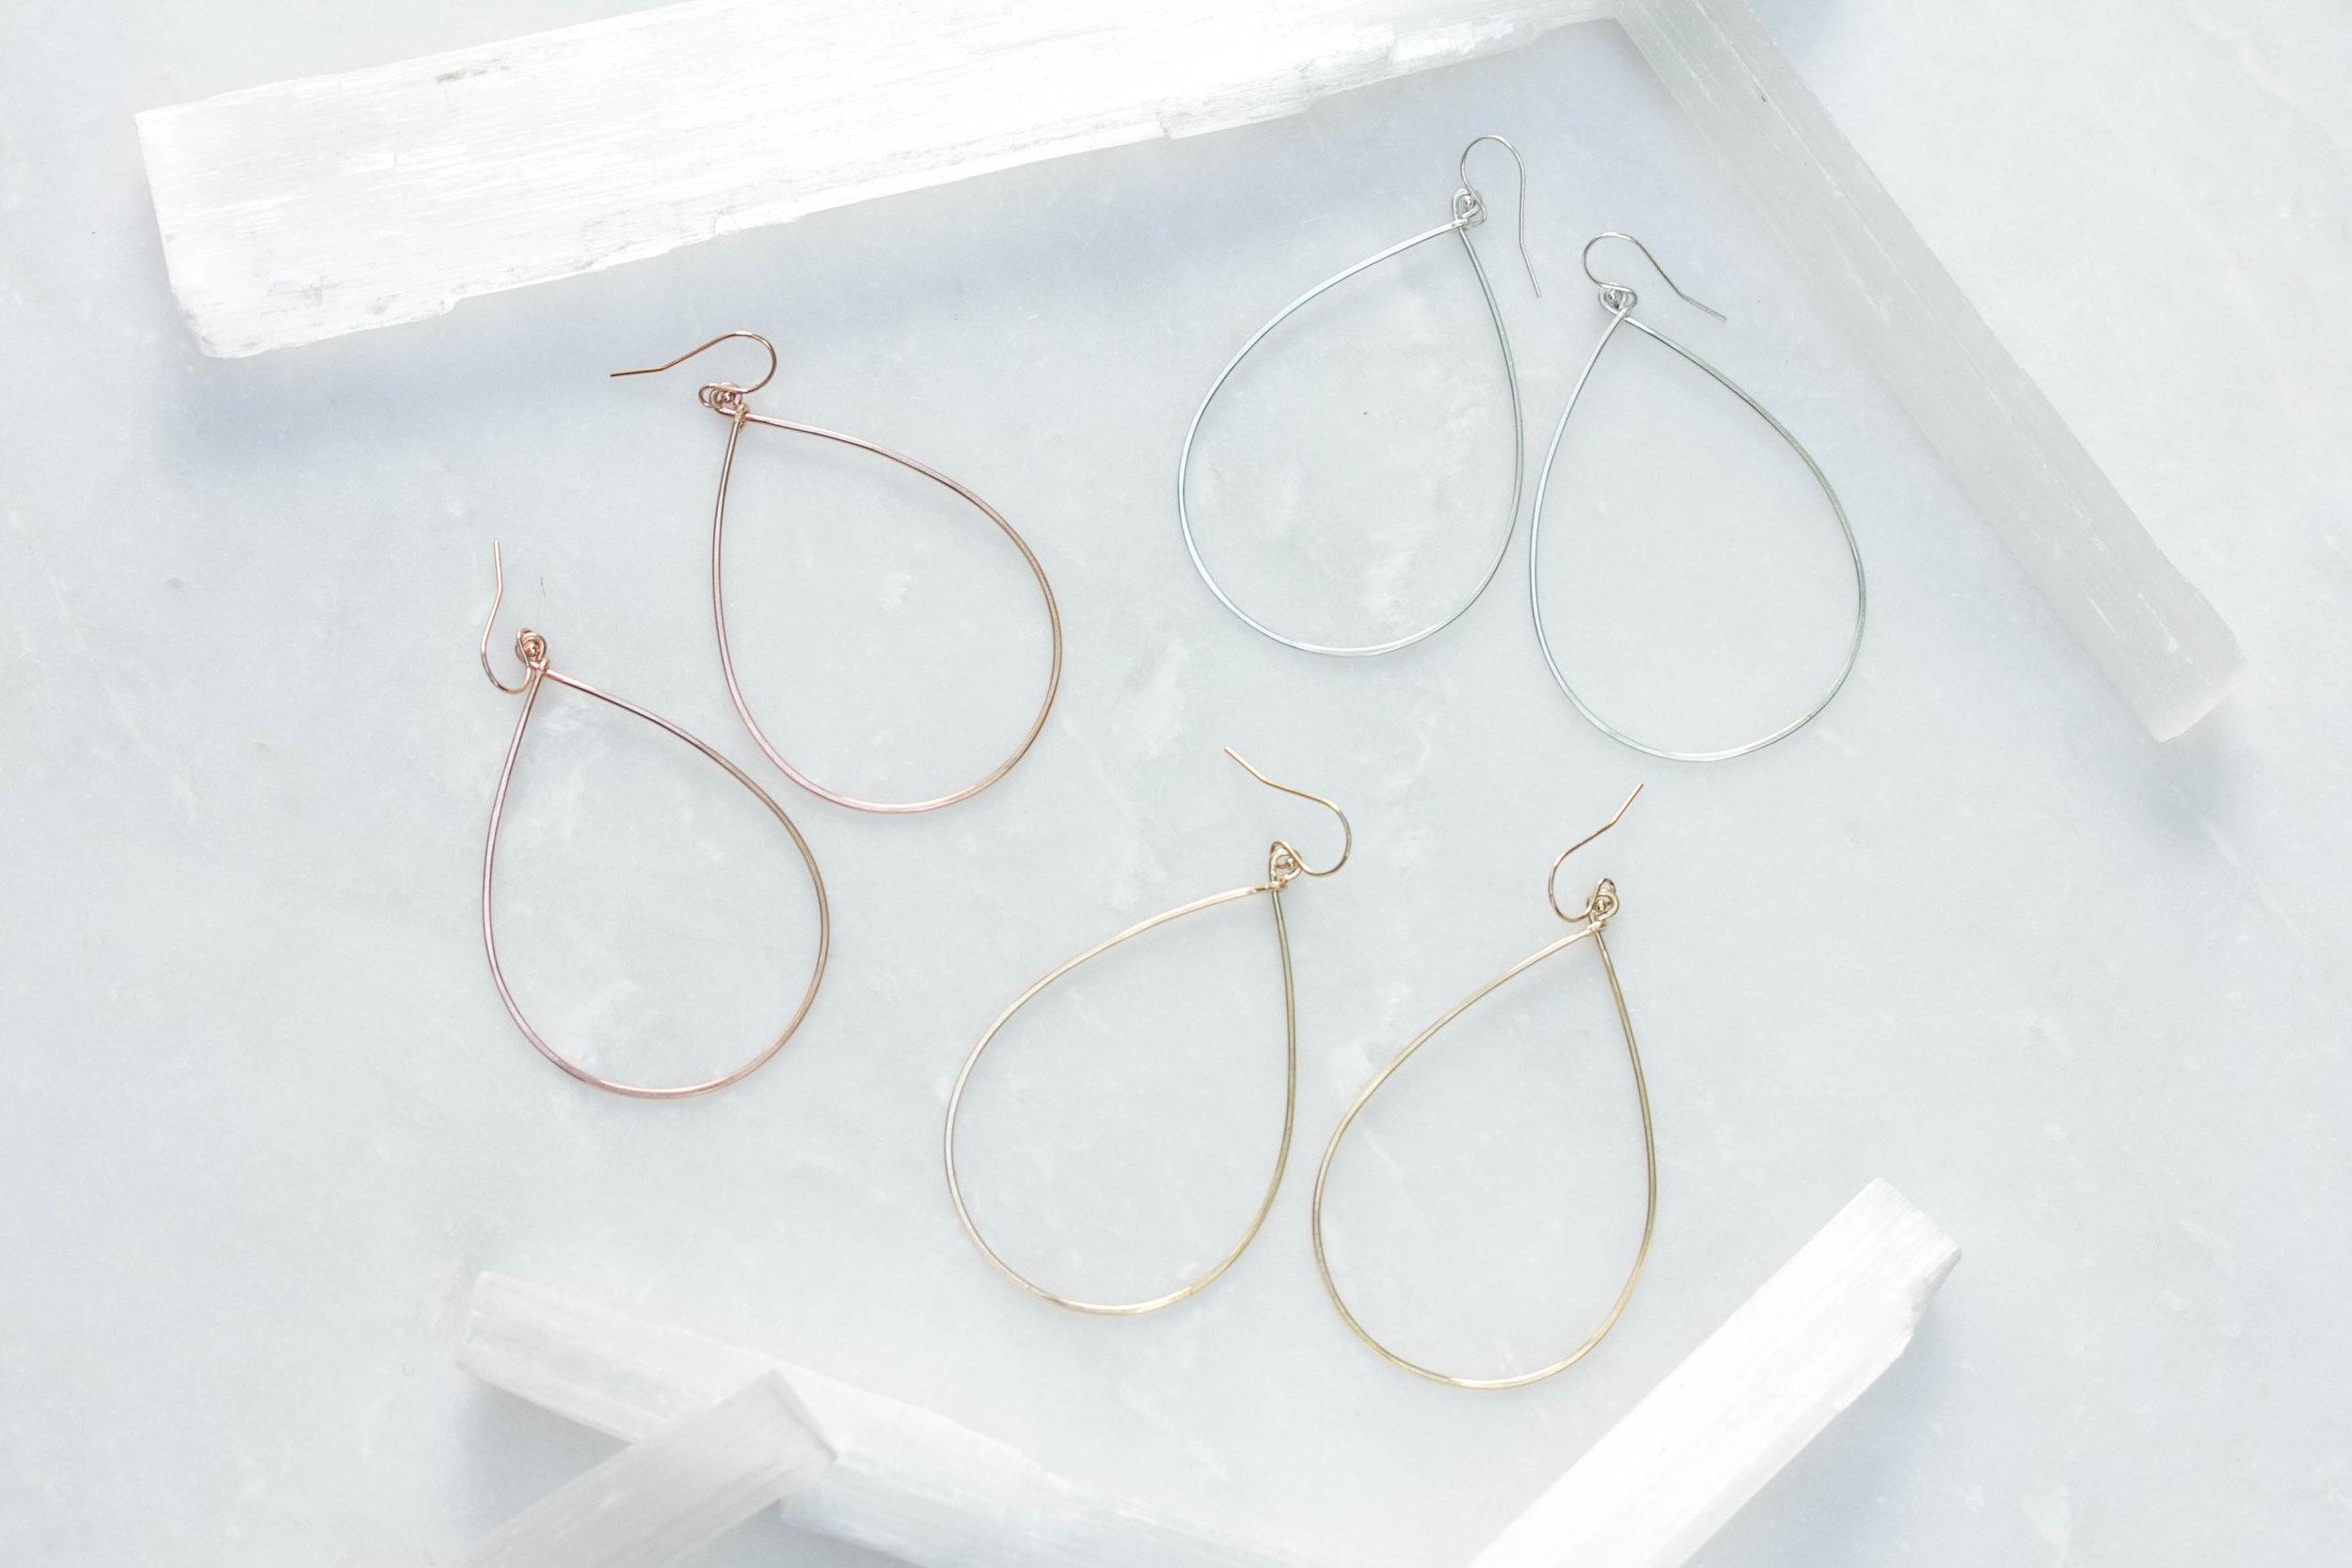 c2f4efe1b ... 14k gold fill or sterling. Large teardrop hoop earrings_Rach B  Jewelry_RB666_1.jpg